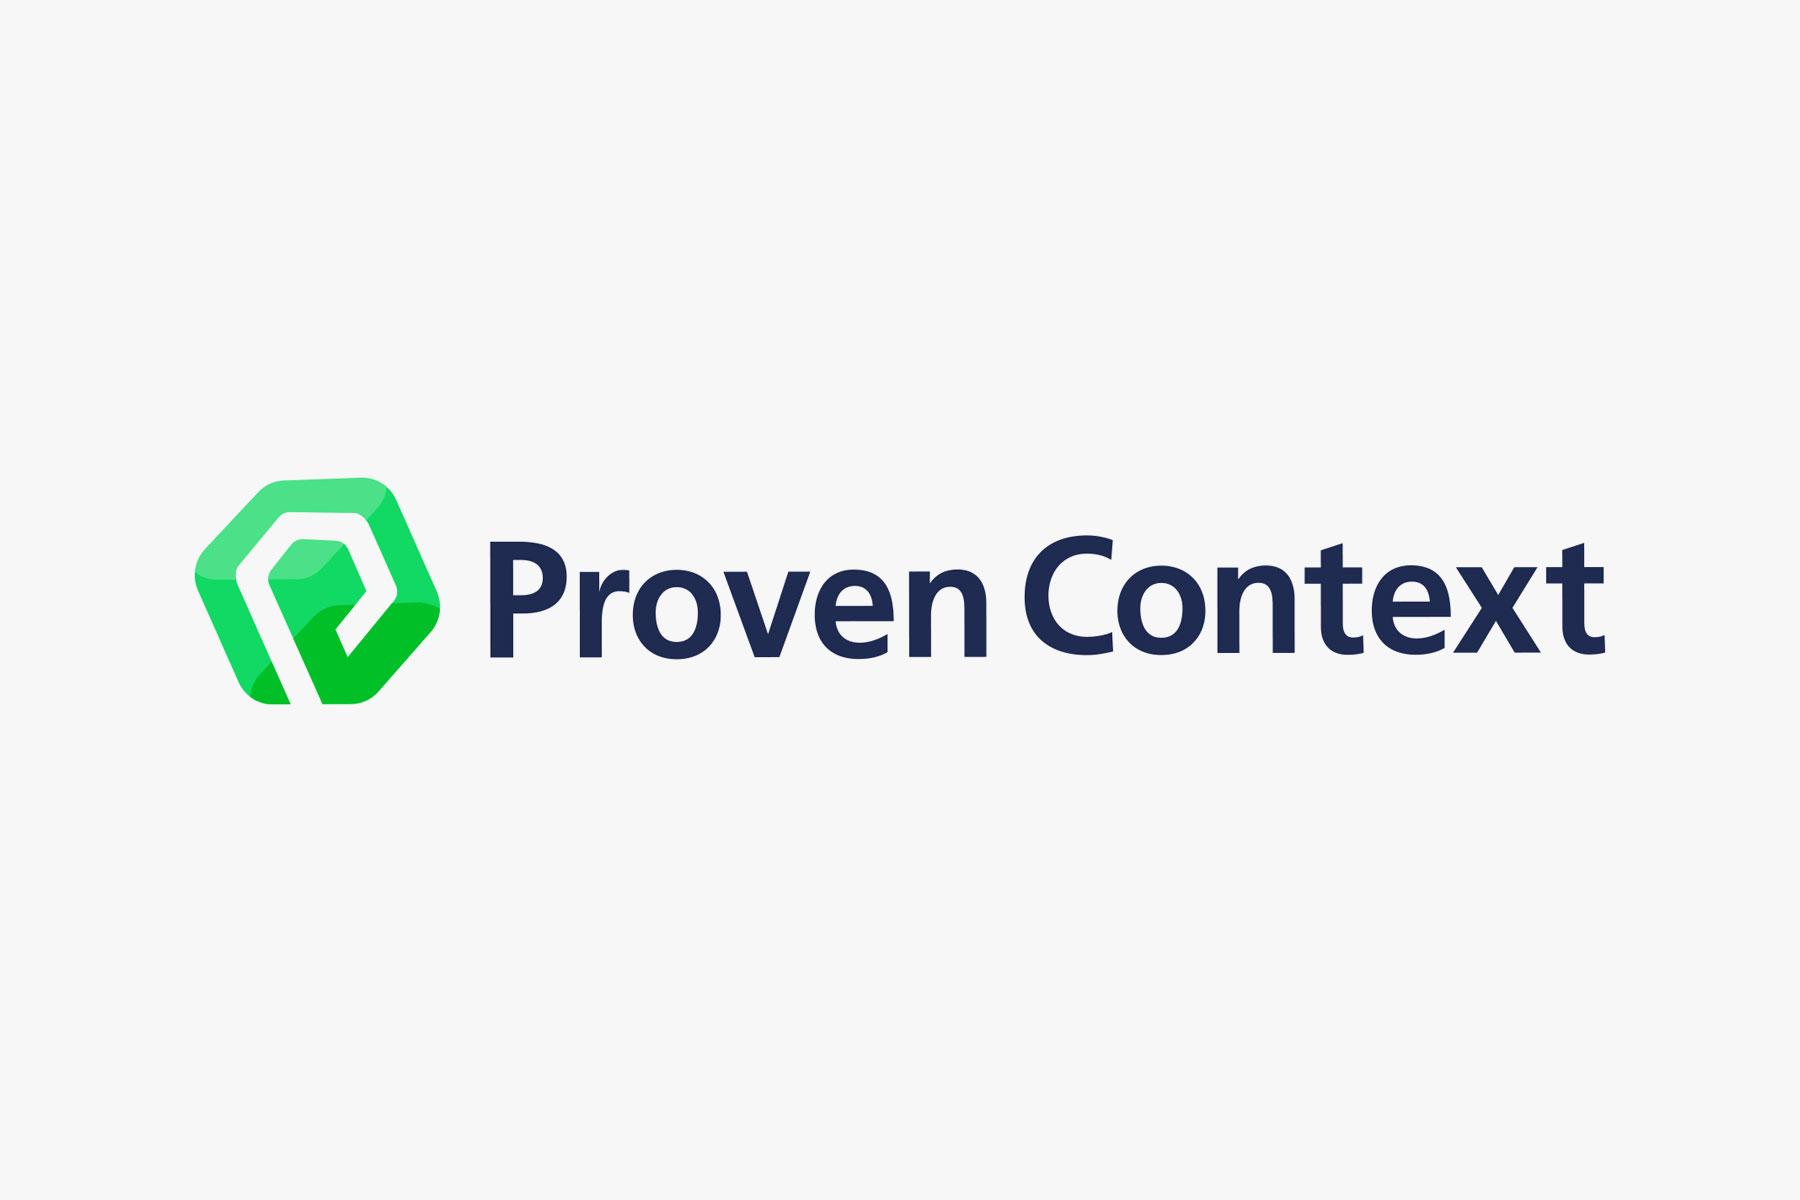 provencontext_3